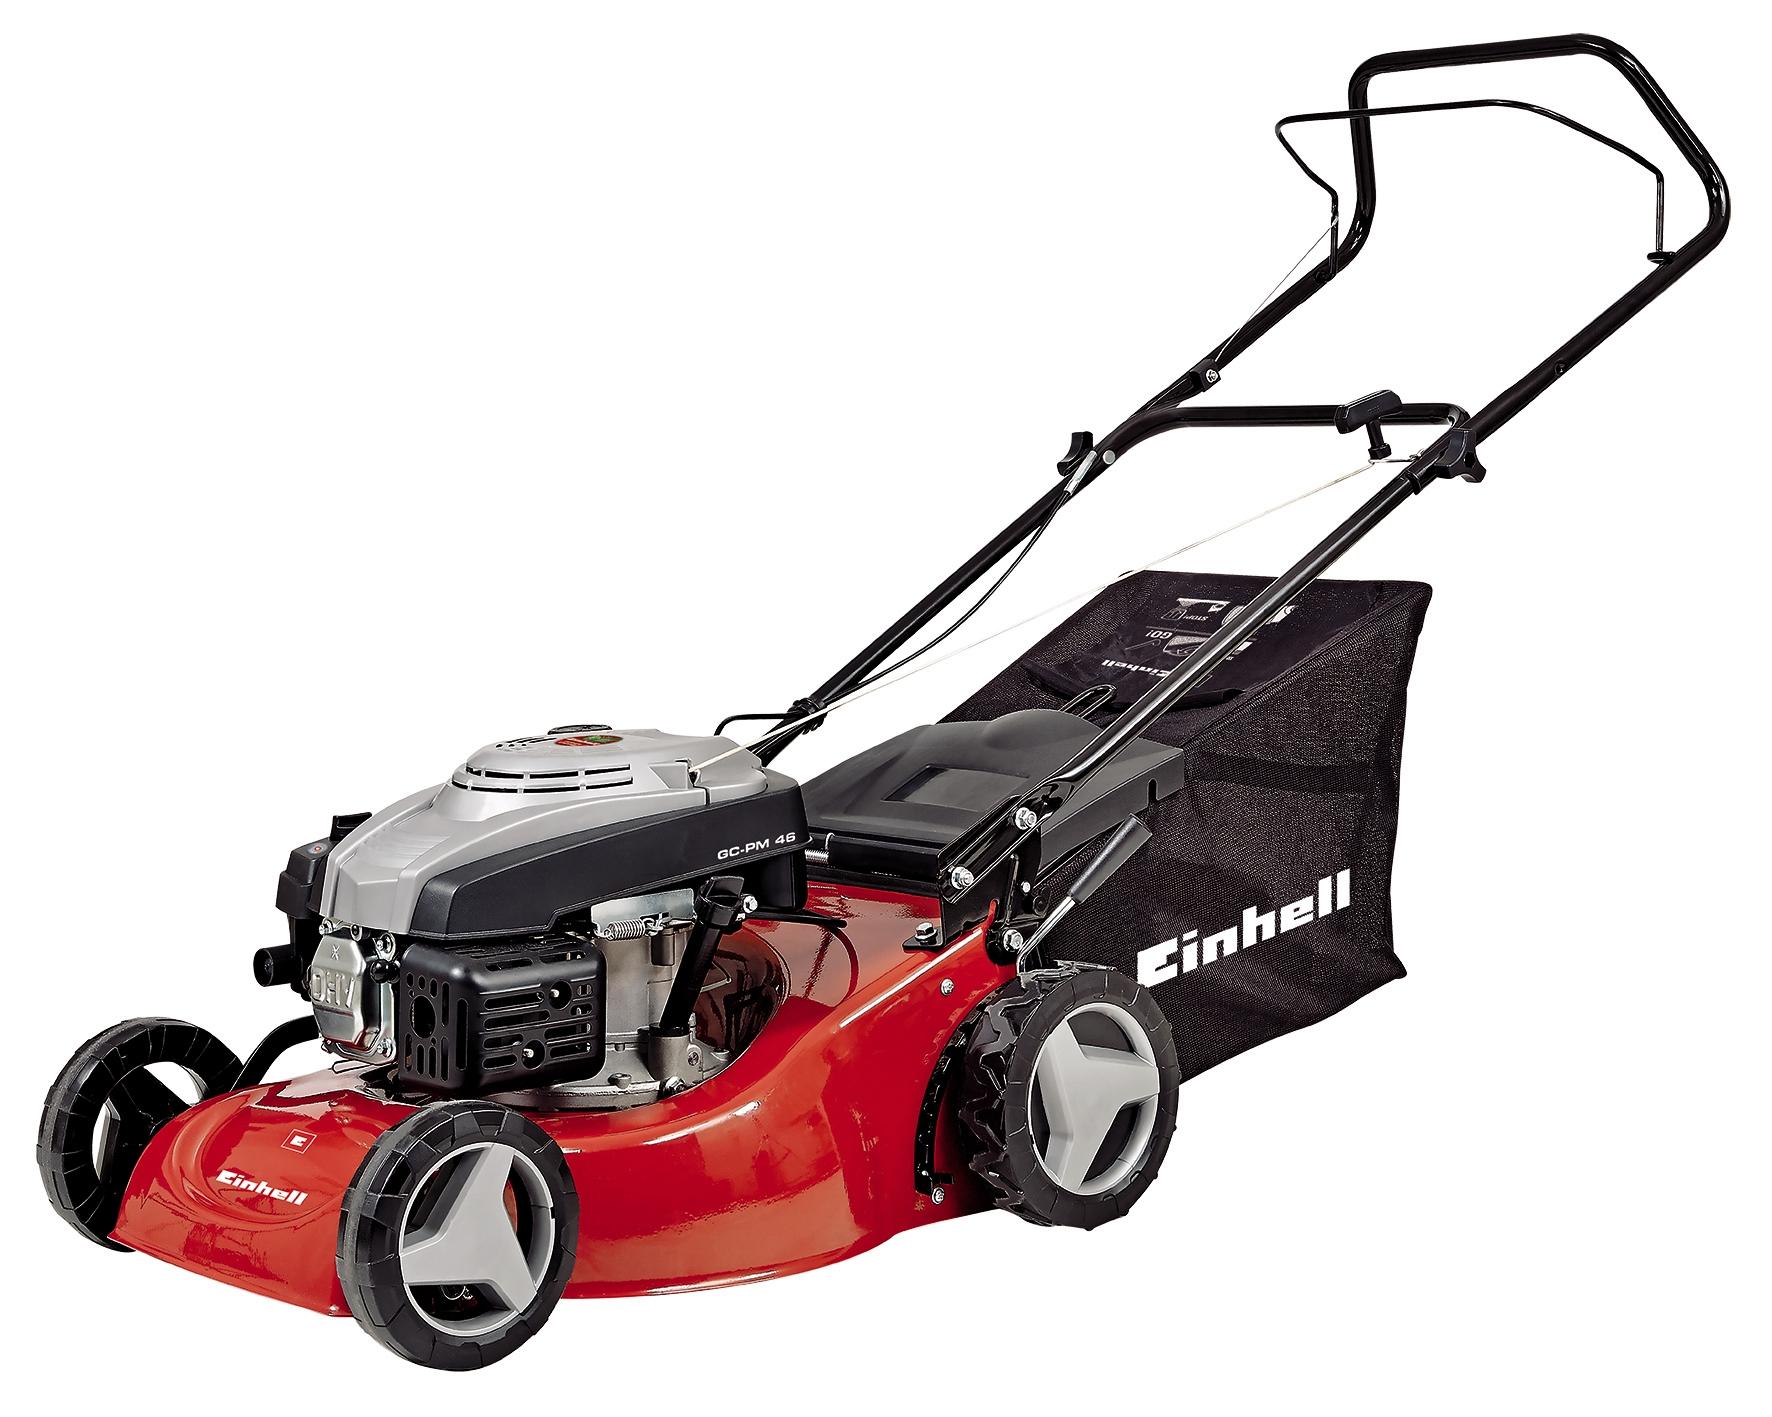 Einhell GC-PM 46-M Hand-Propelled Petrol Lawn Mower